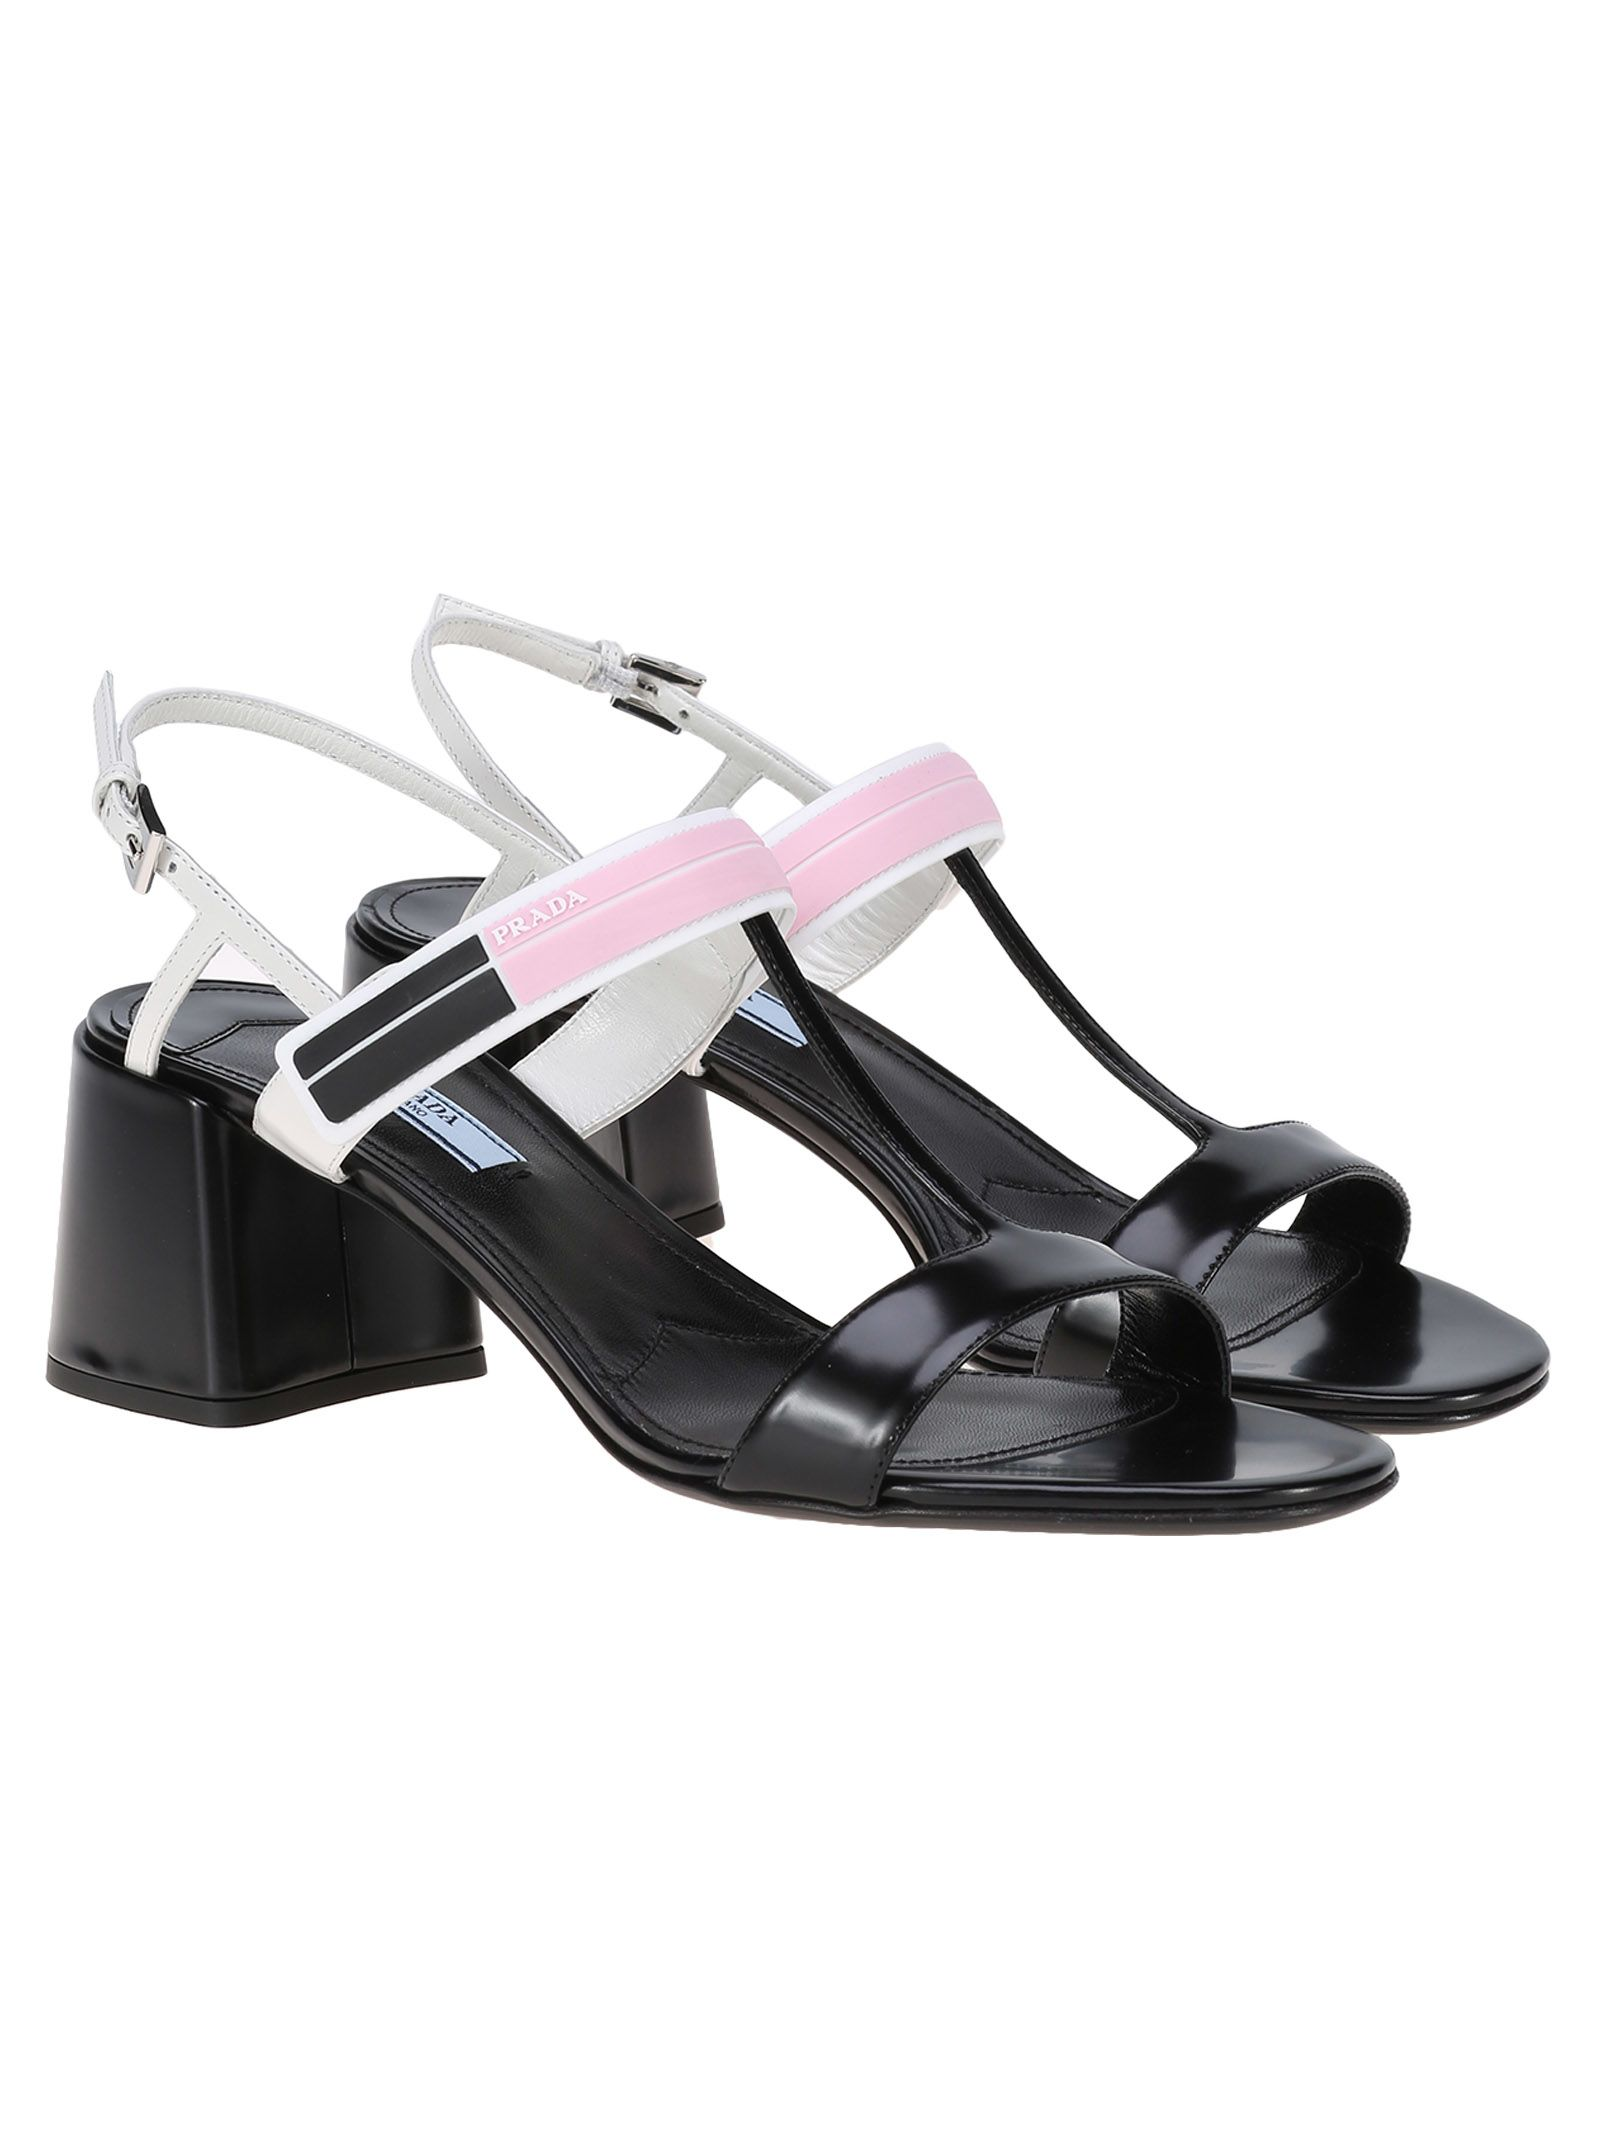 Prada Two Tone Sandals